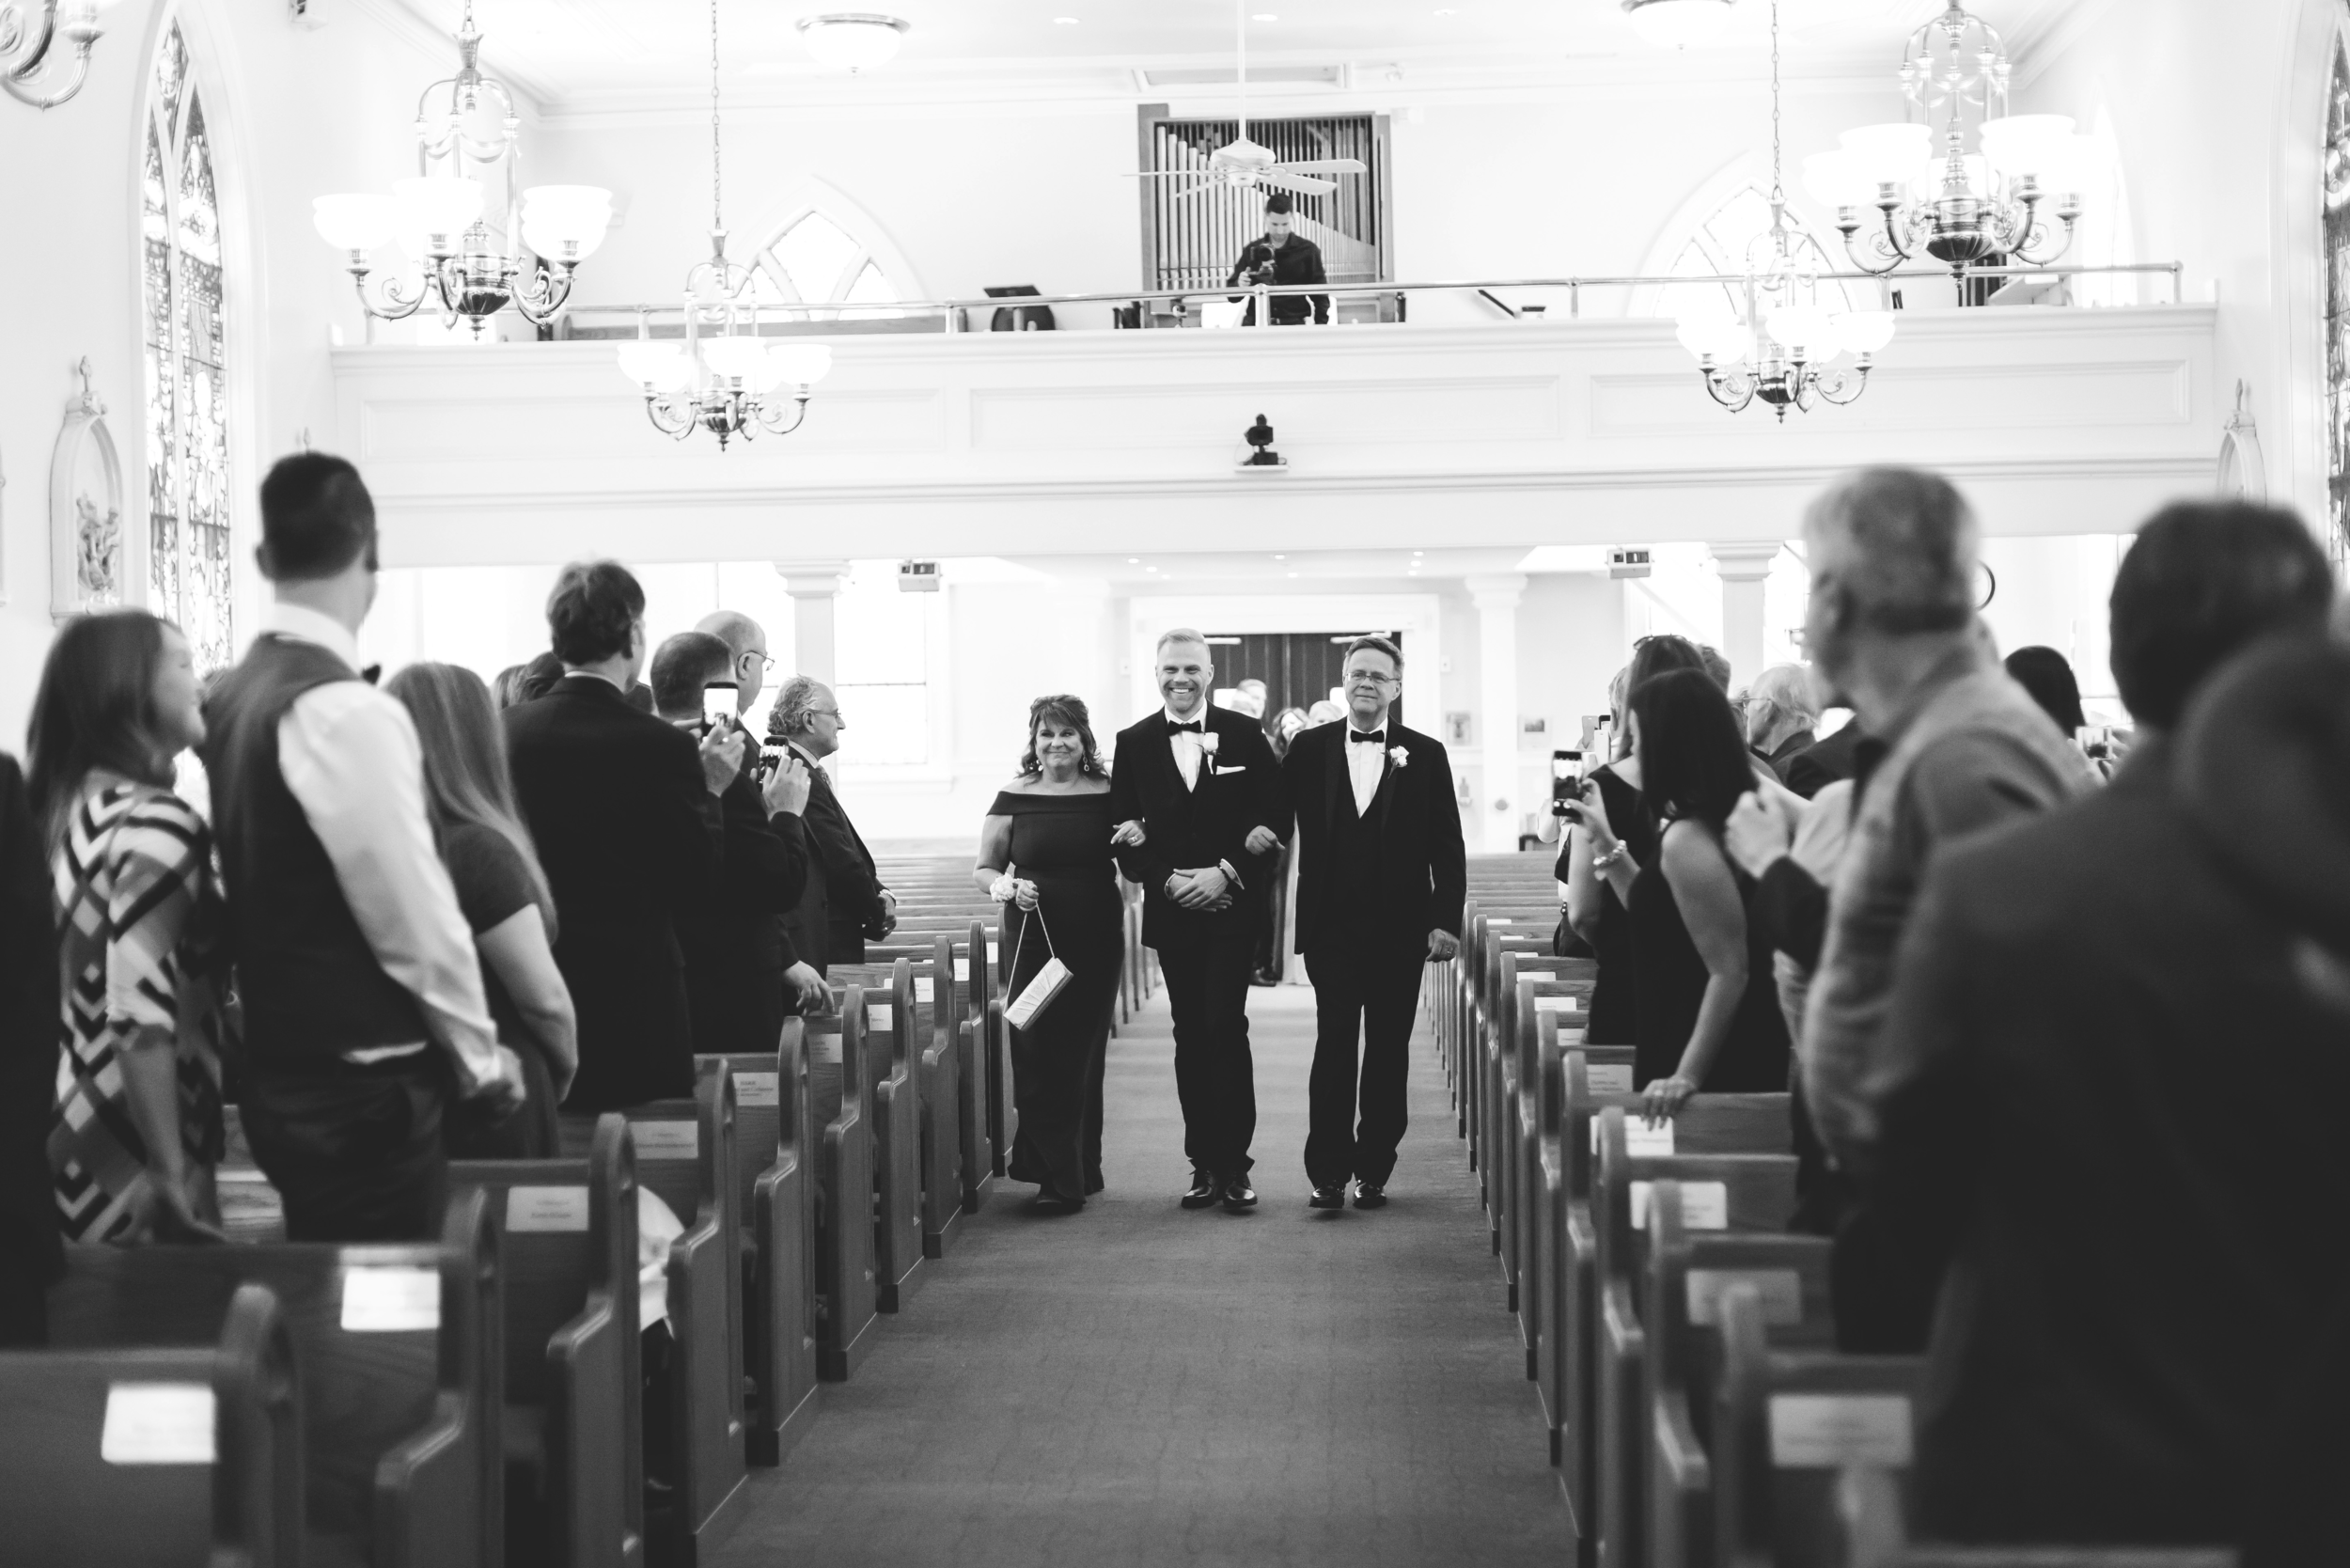 Wedding-Harbour-Banquet-Center-Oakville-Photographer-Wedding-Hamilton-Saint-James-Espresso-Downtown-HamOnt-GTA-Niagara-Toronto-Moments-by-Lauren-Photography-Photo-Image-11.png